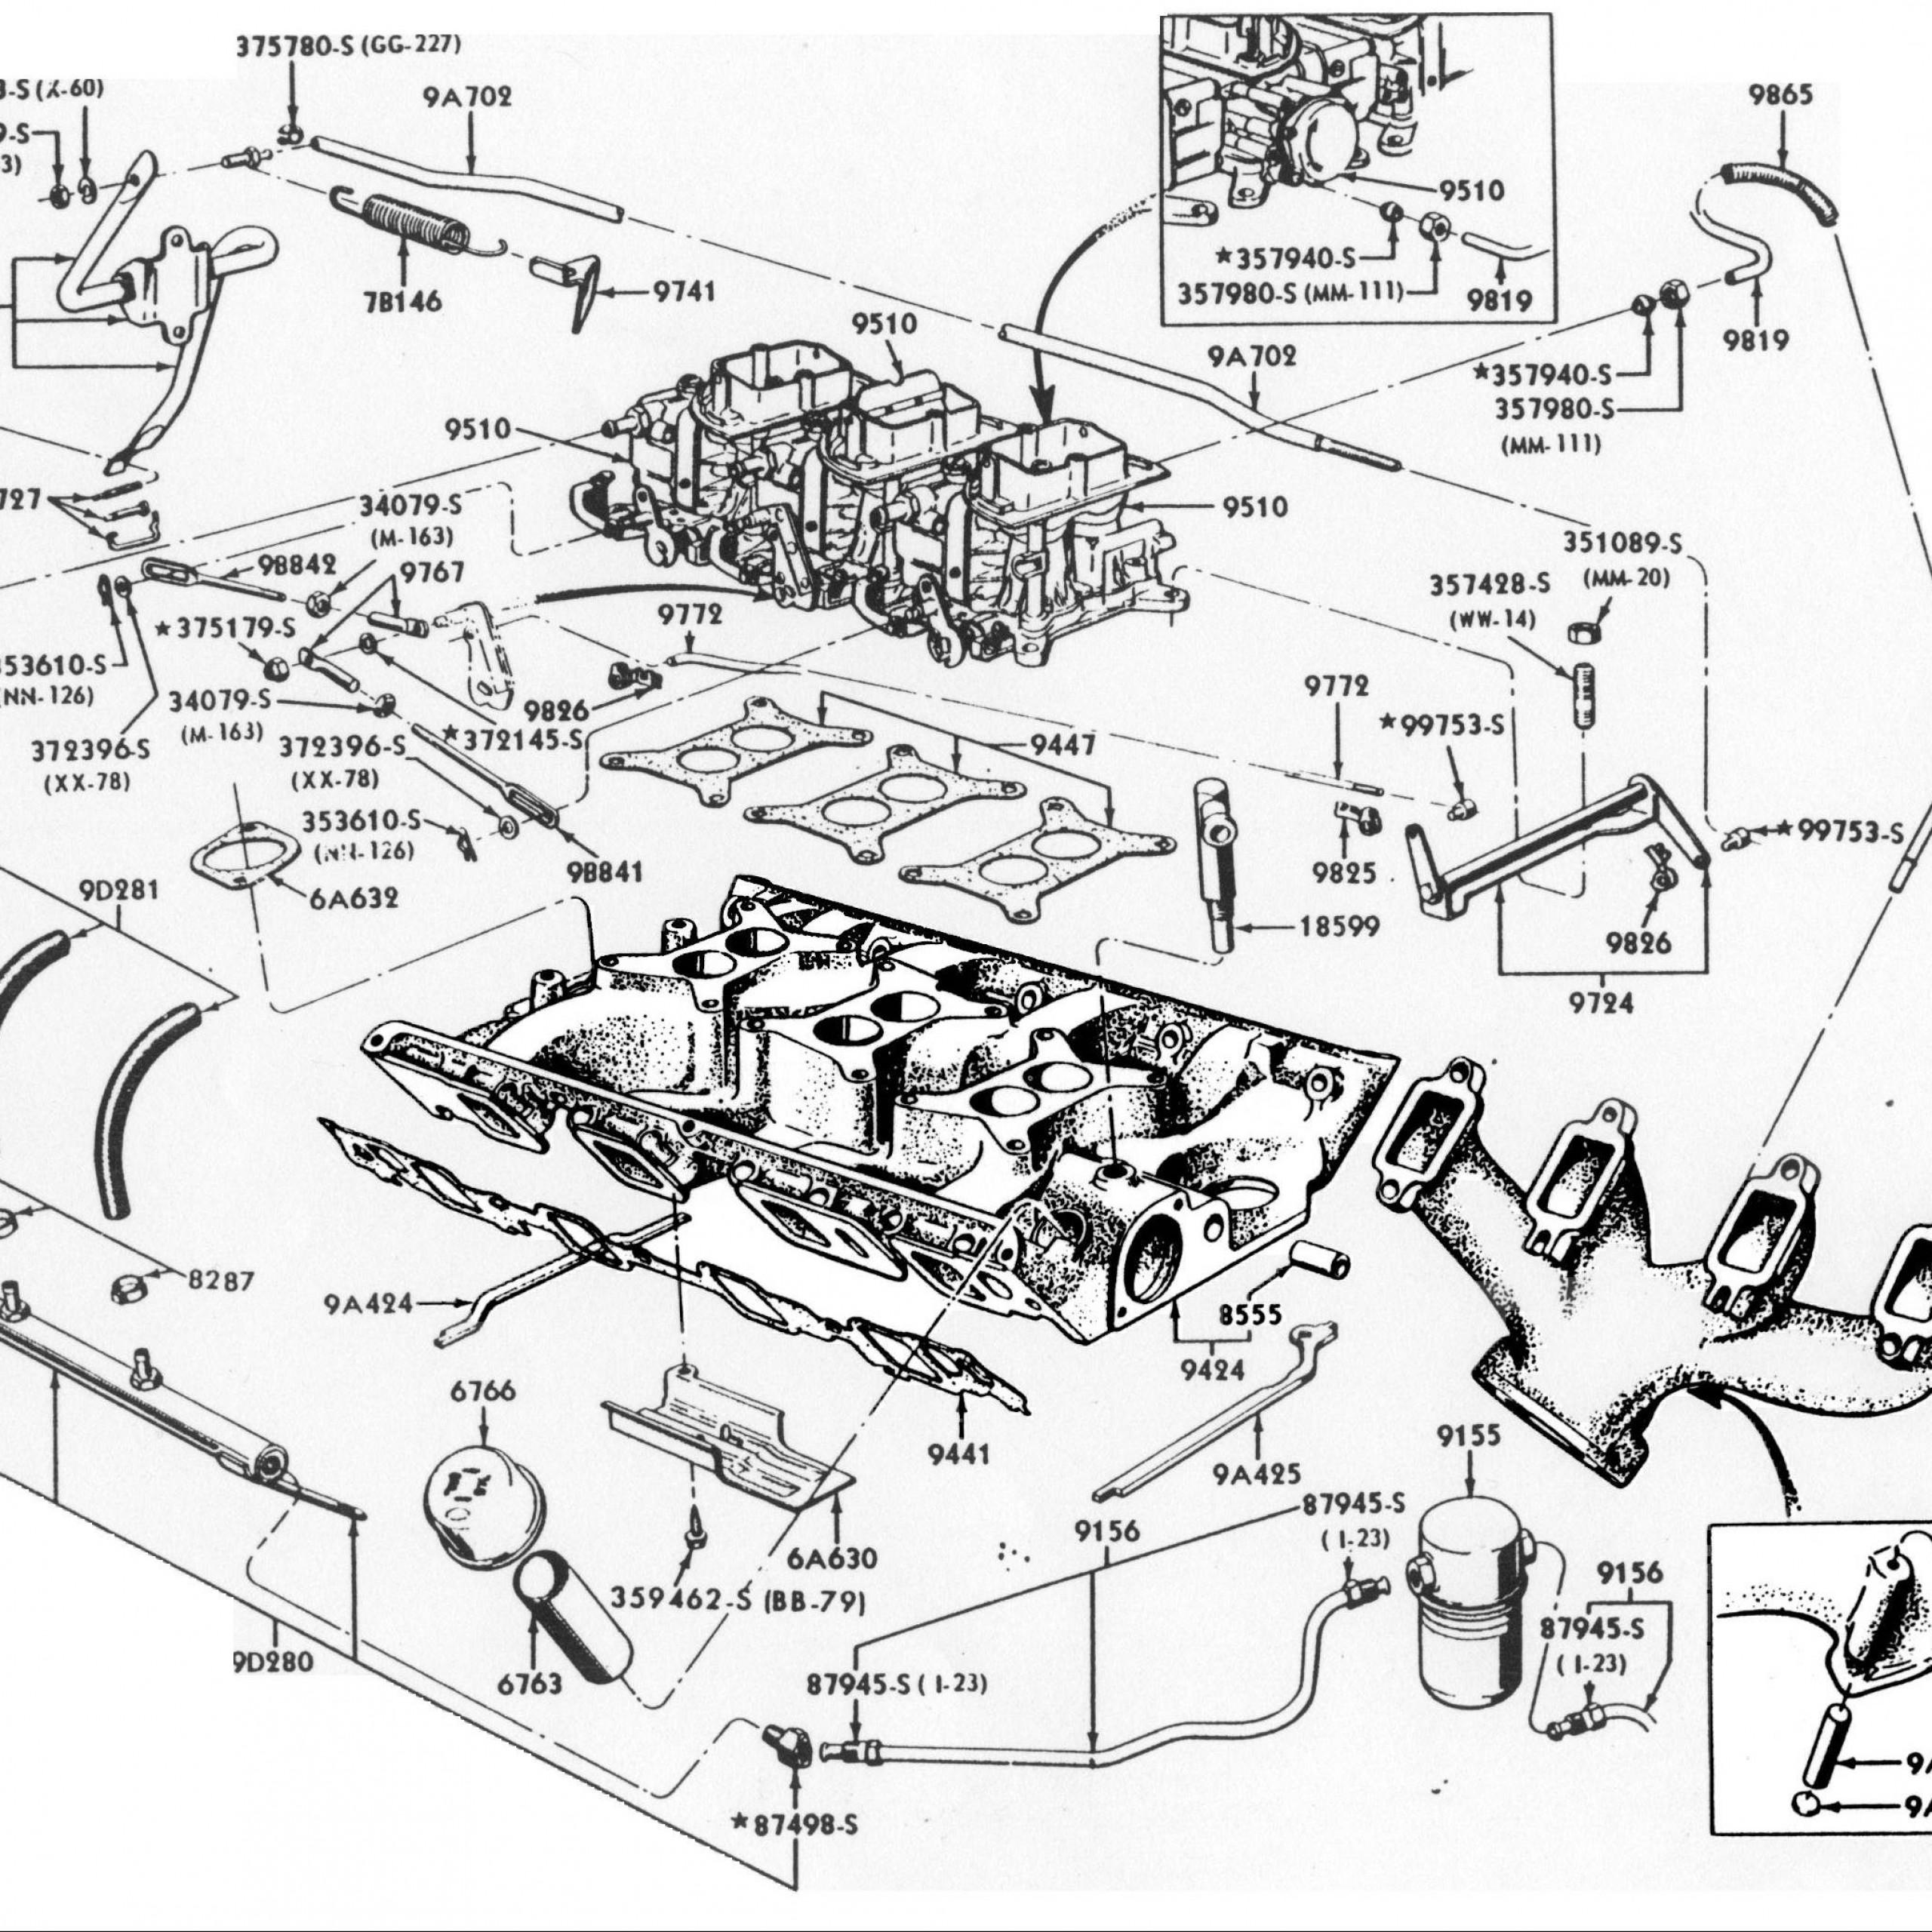 Diagram] Ford 460 Engine Diagram Full Version Hd Quality